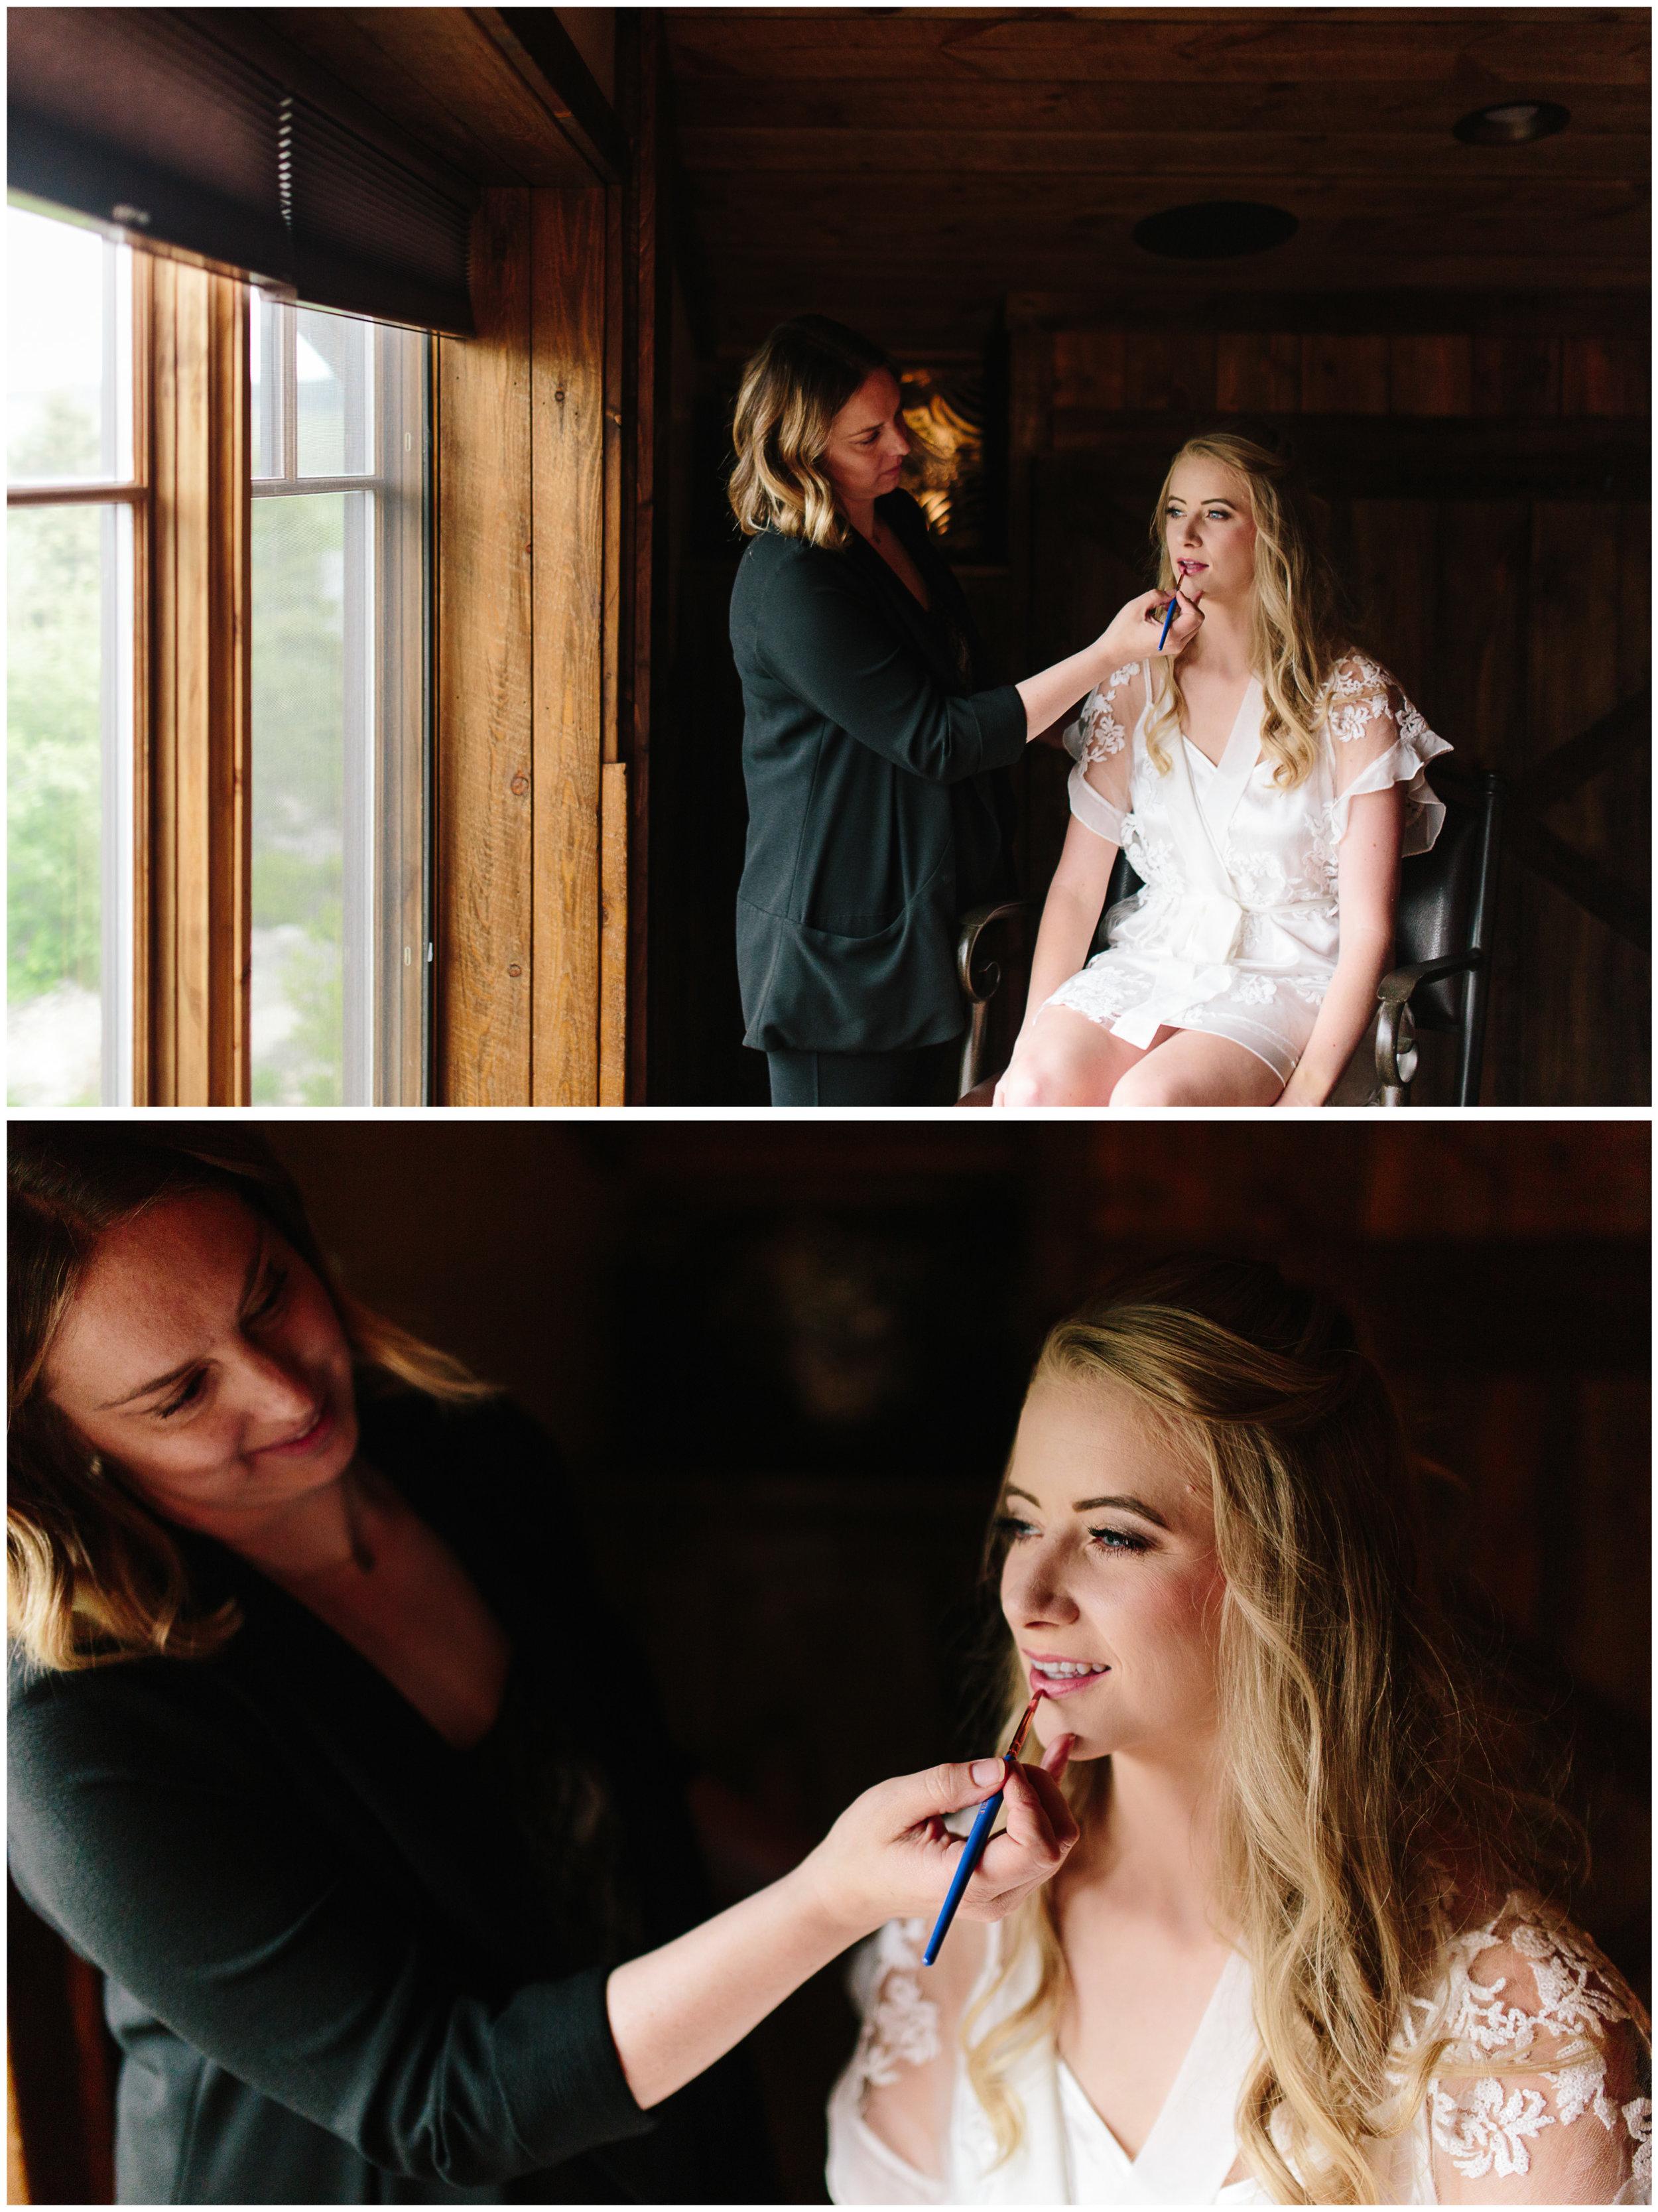 spruce_mountain_ranch_wedding_5.jpg